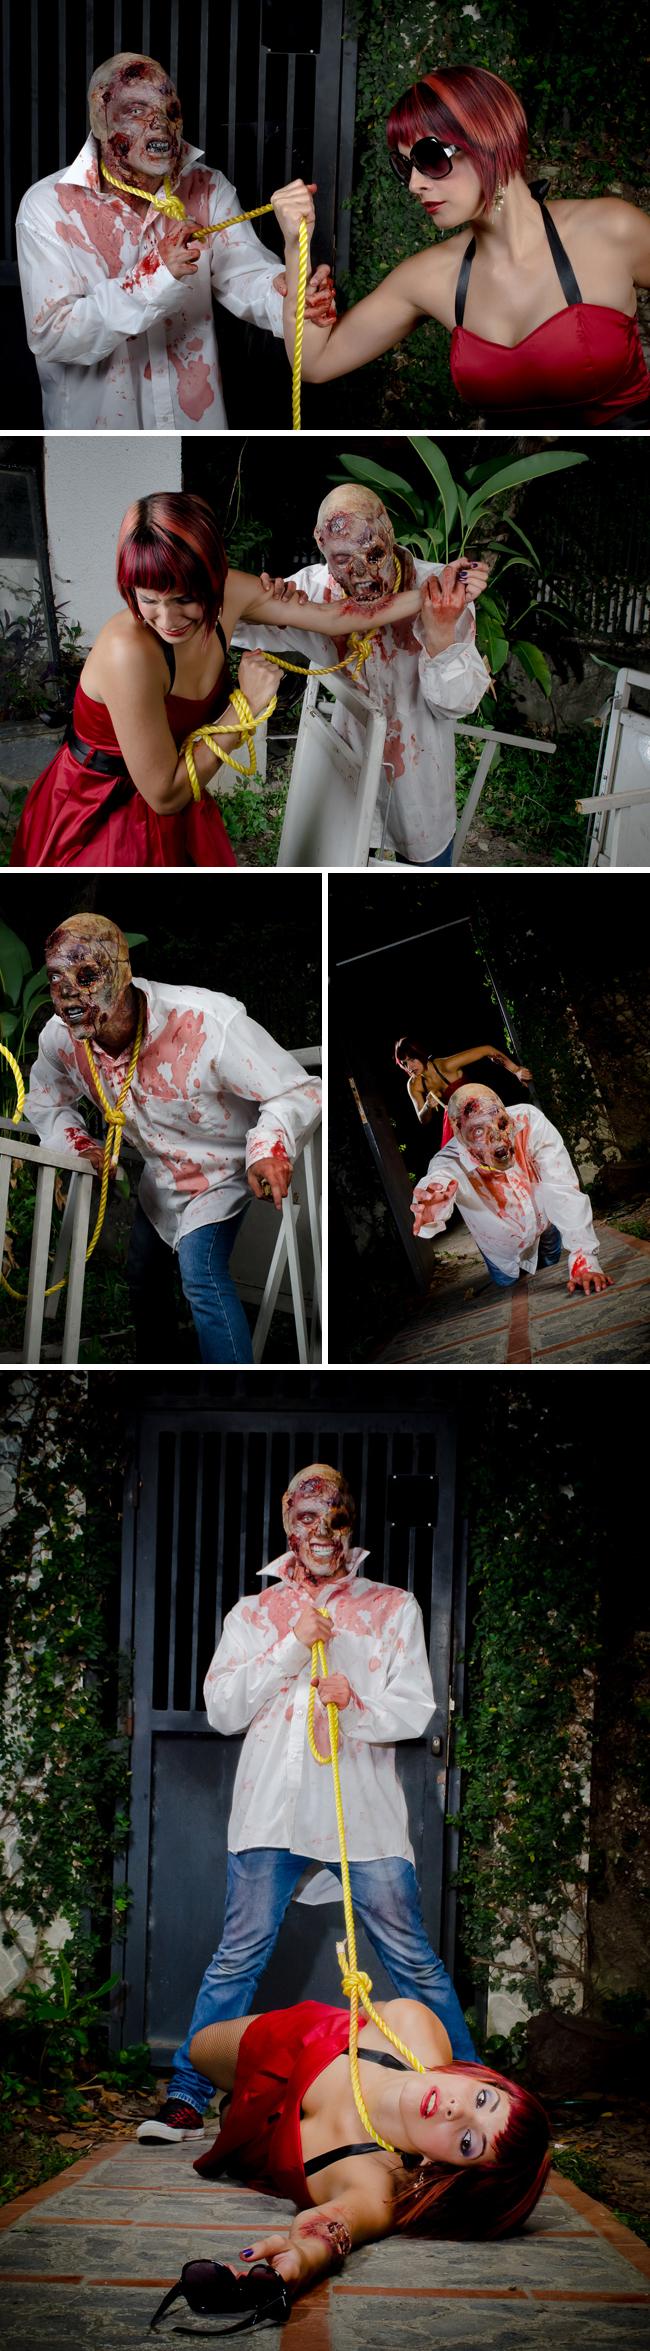 Abigail-zombies-zombi-caracterizacion-maquillaje-fx-maquillaje-cine-television